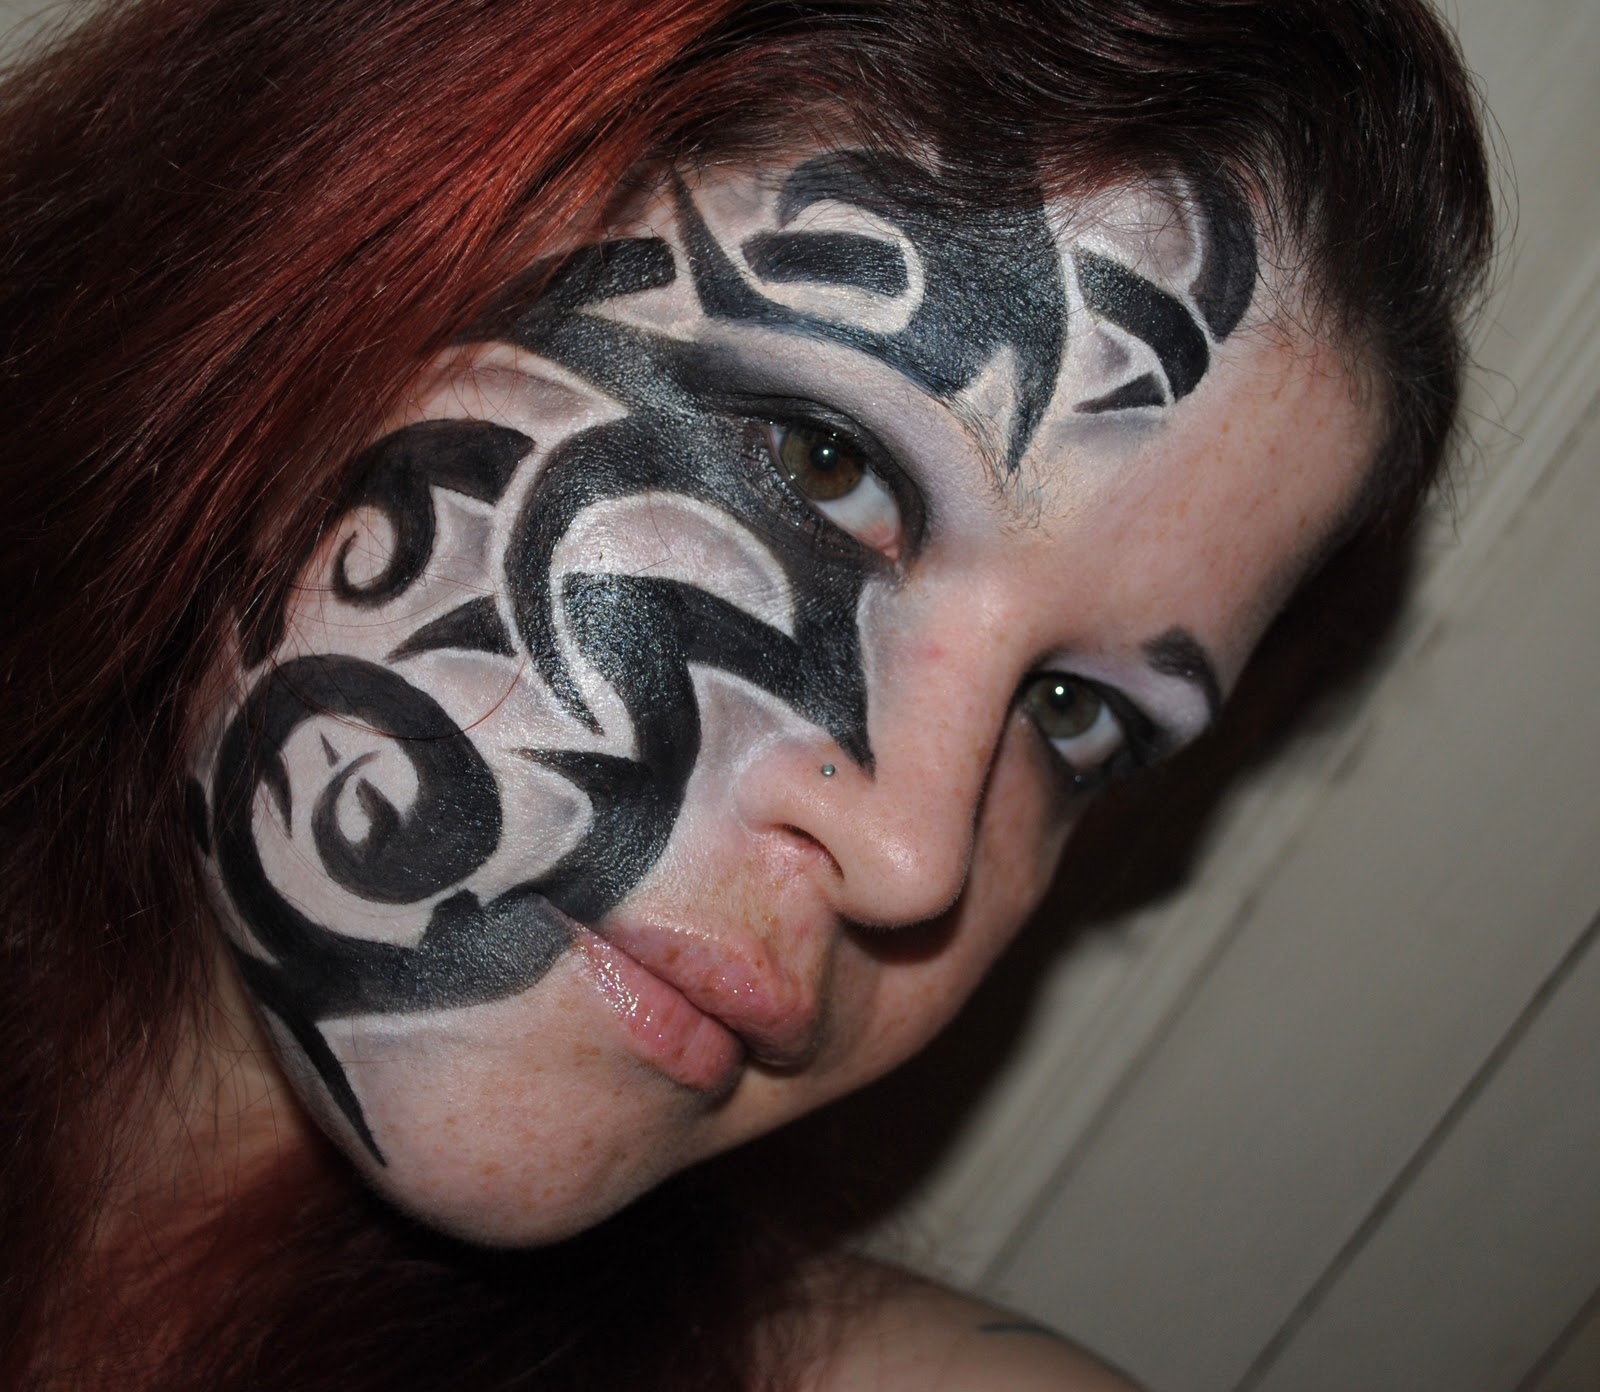 Appealing Tattoos for Women 110